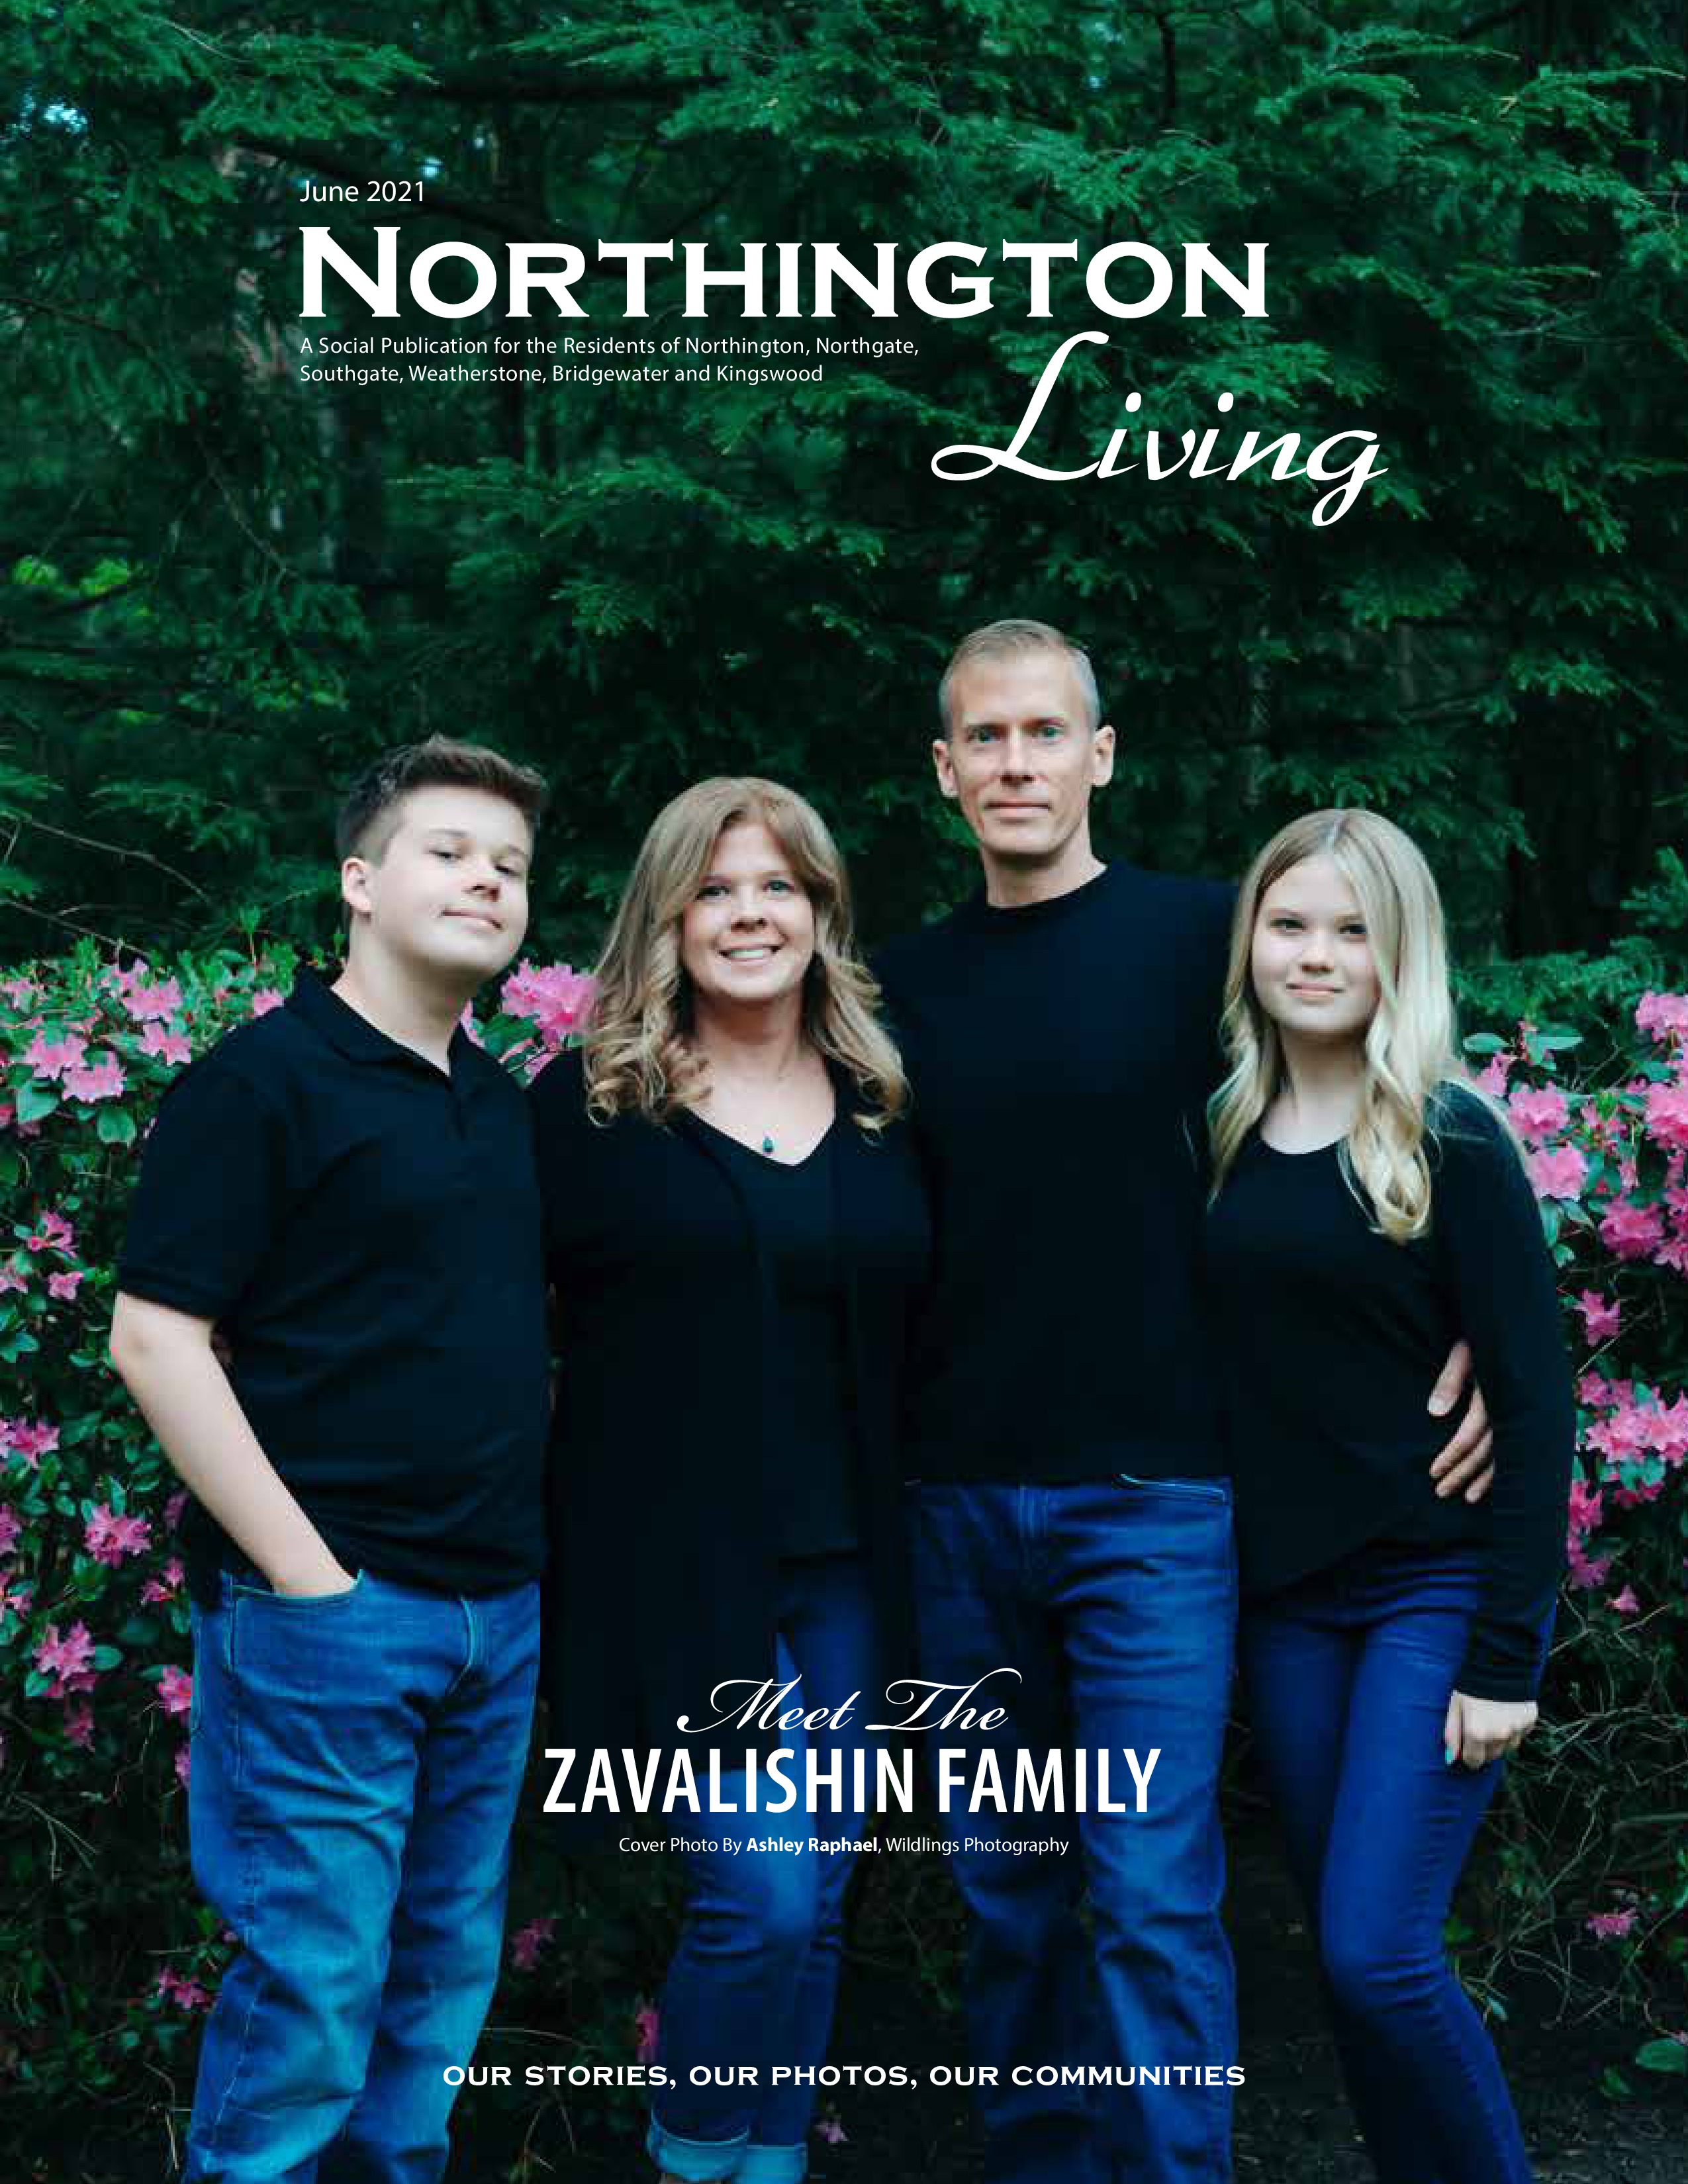 Northington Living 2021-06-01